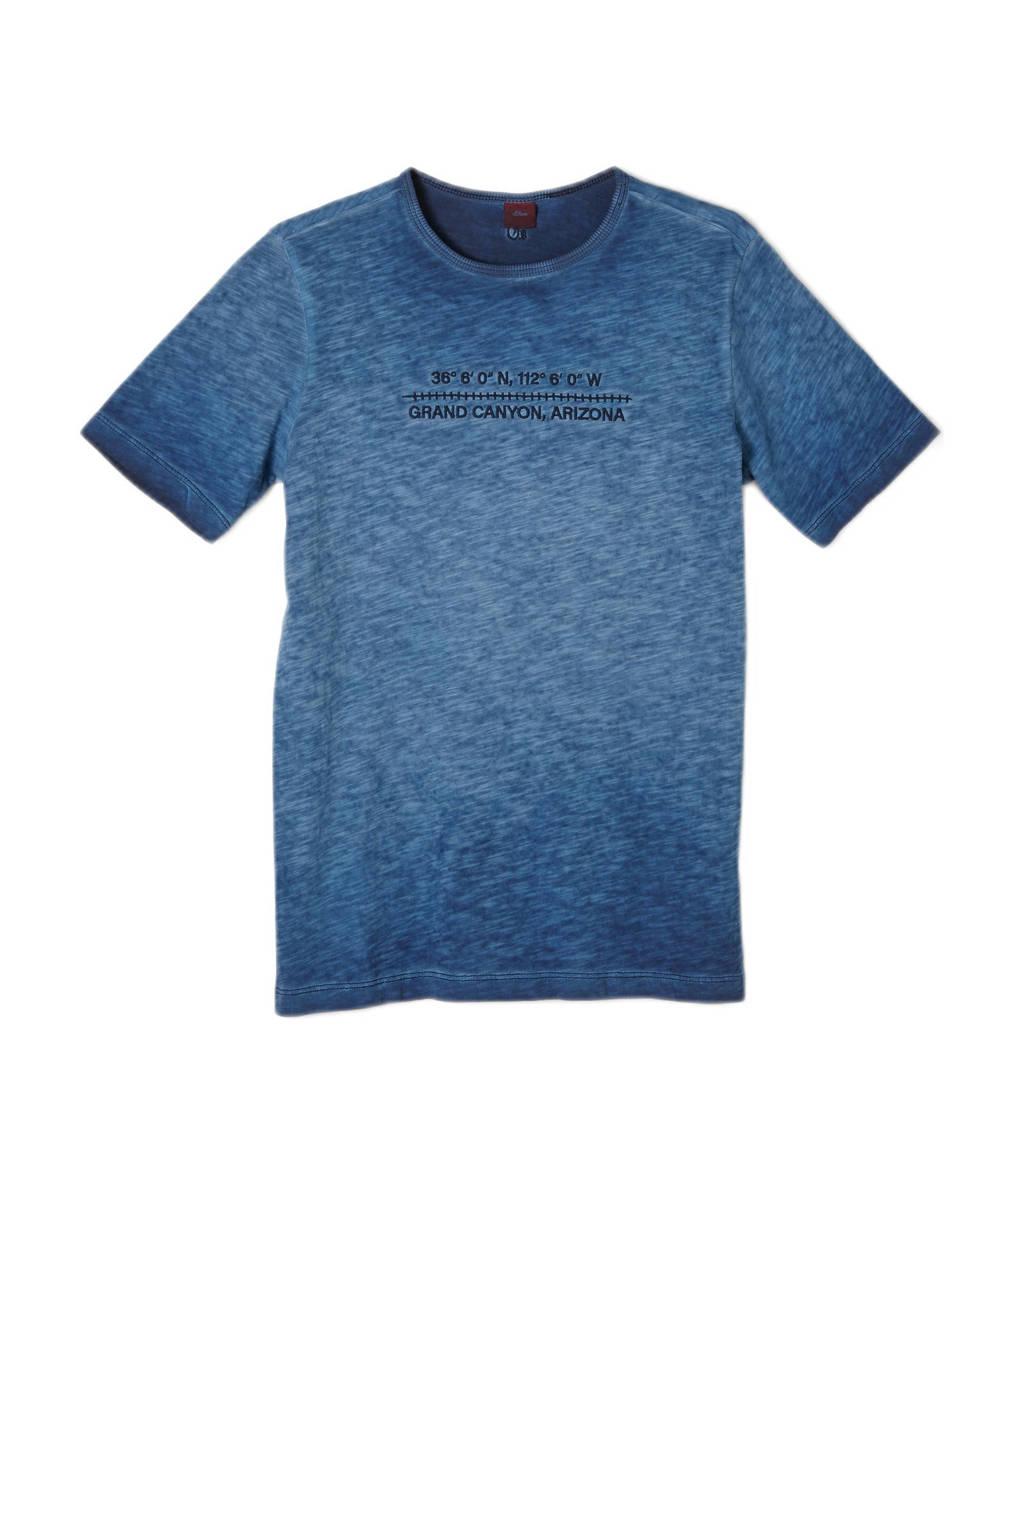 s.Oliver T-shirt met tekst donkerblauw, Donkerblauw